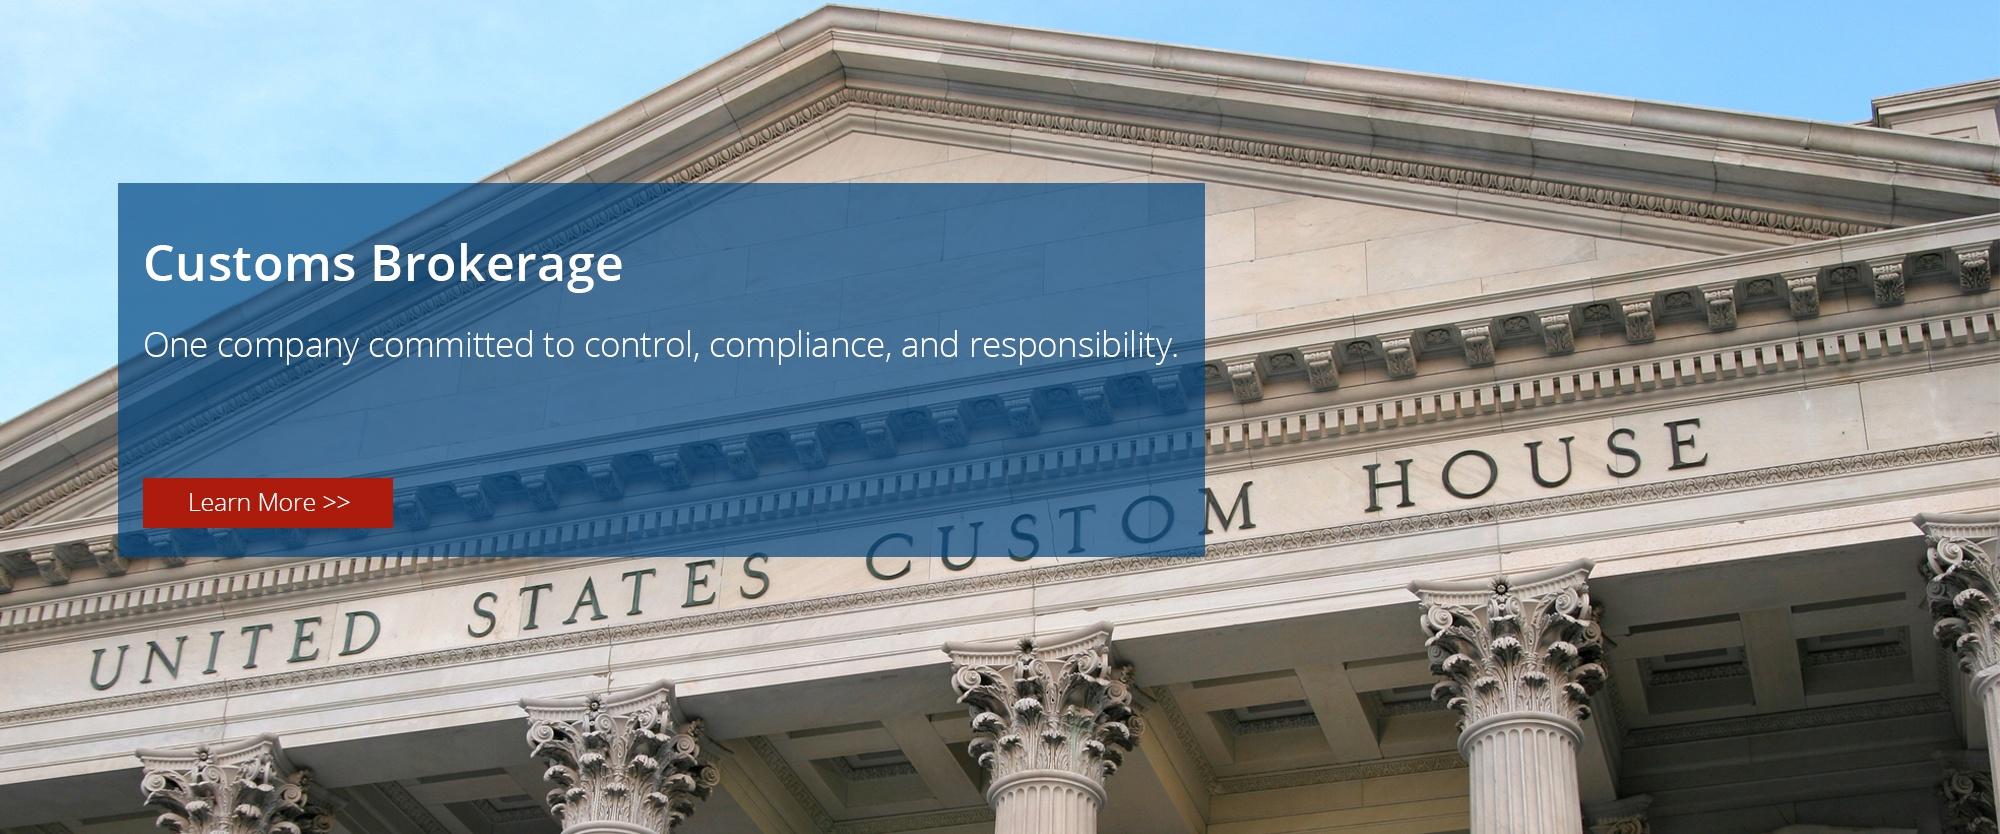 Customs Brokerage, Customs Import, Customs Export, CFS Station